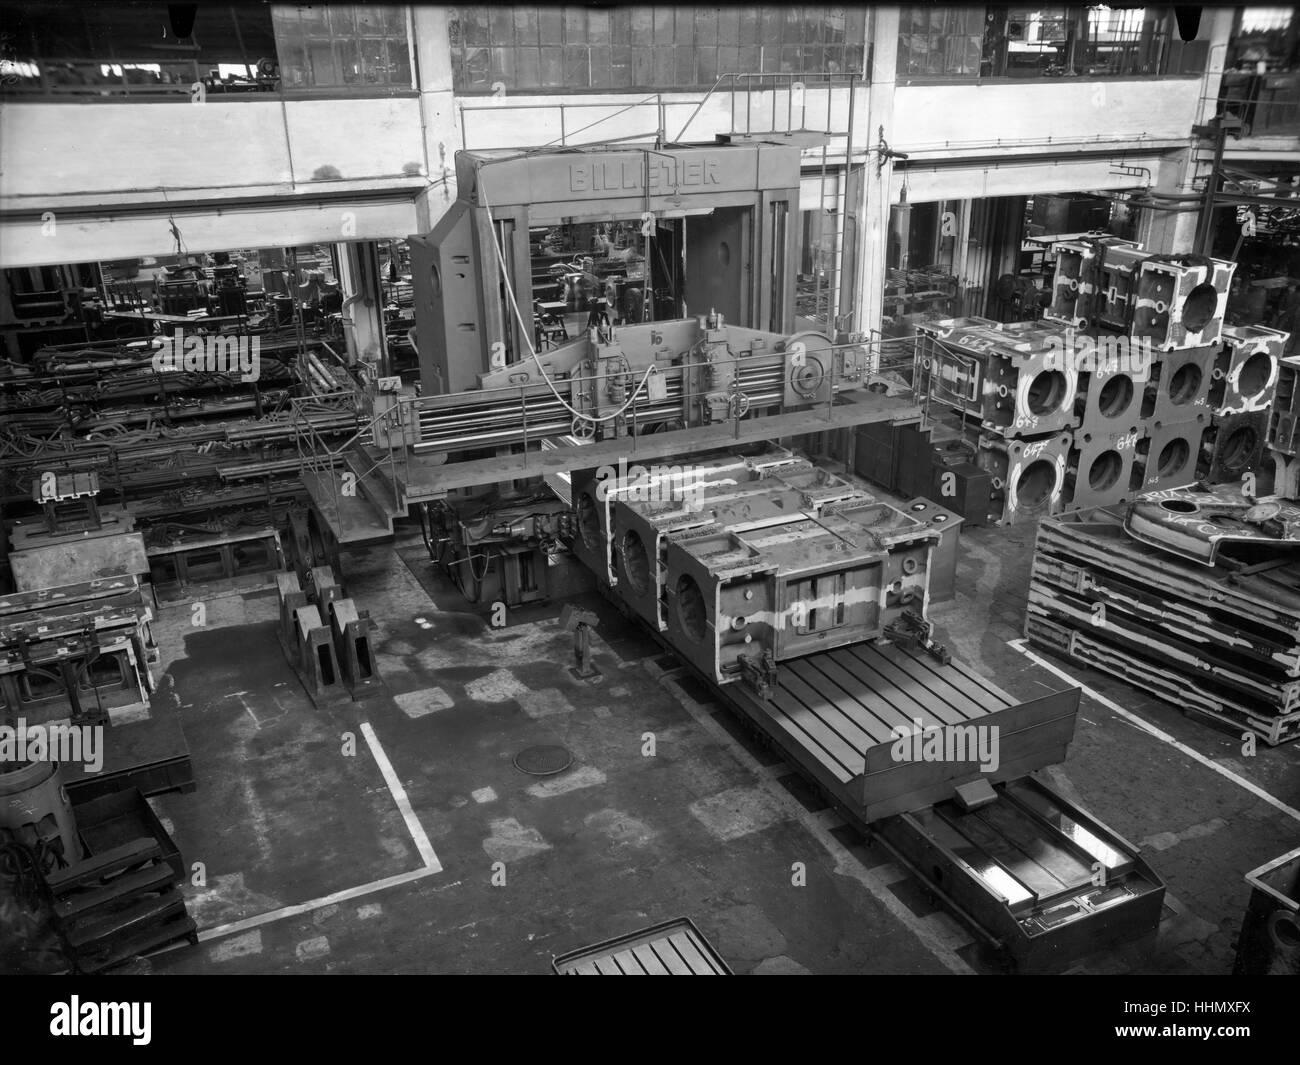 1930 - 40. Fiat - Ansaldo grande fabbrica di motori in Genova San Pier d'Arena, sanpierdarena, Italia. Immagini Stock